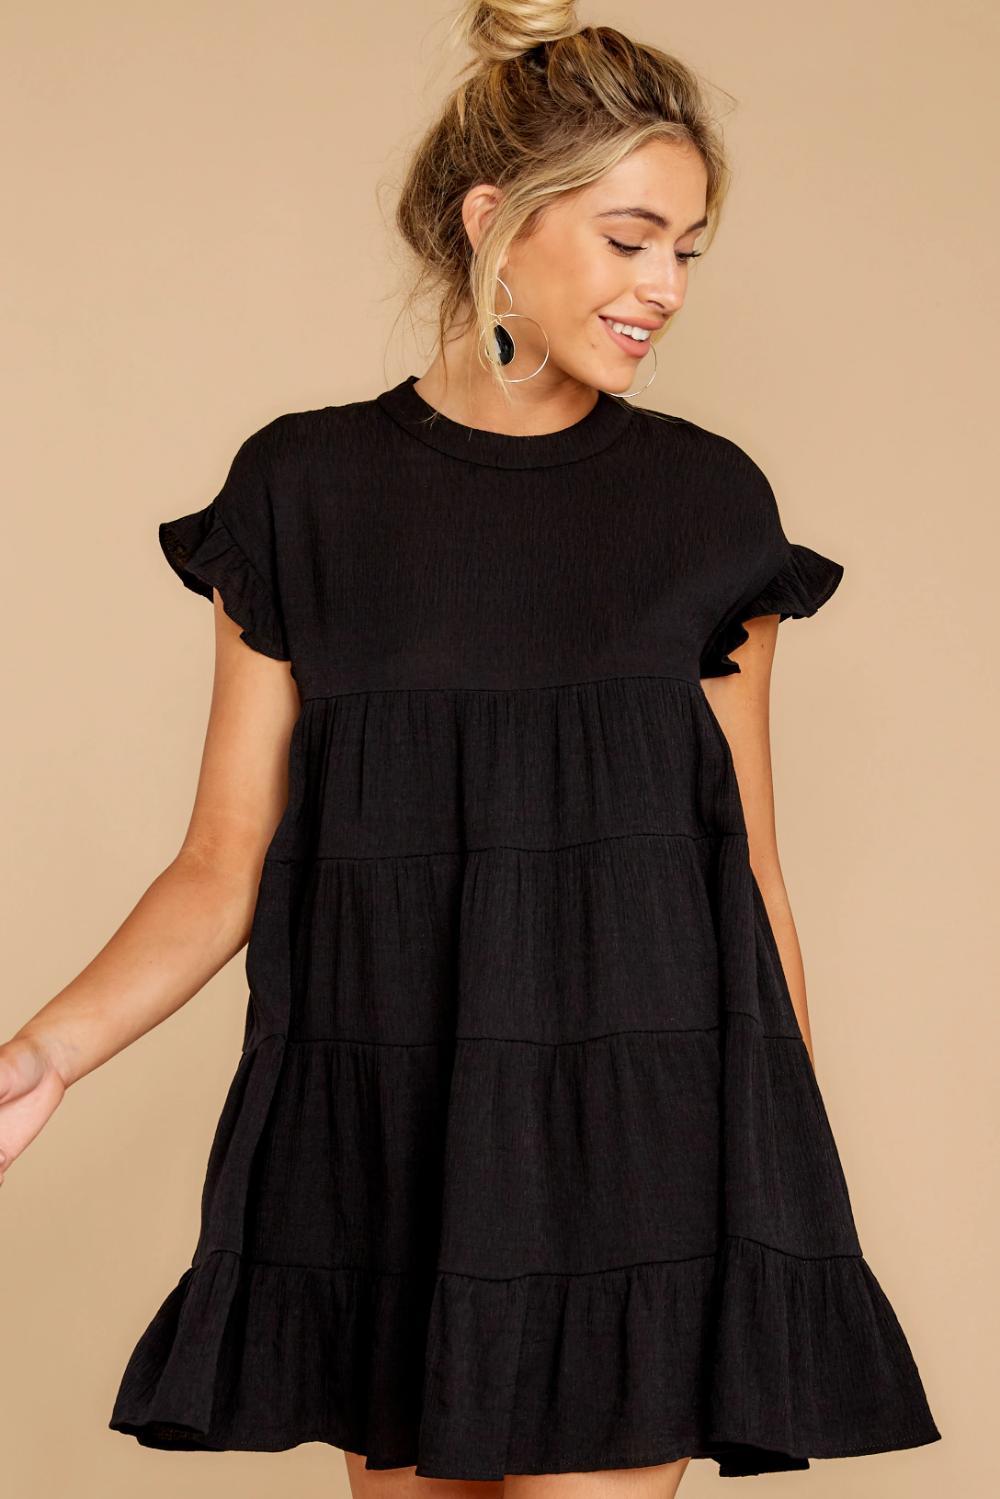 Nothing More Nothing Less Black Dress